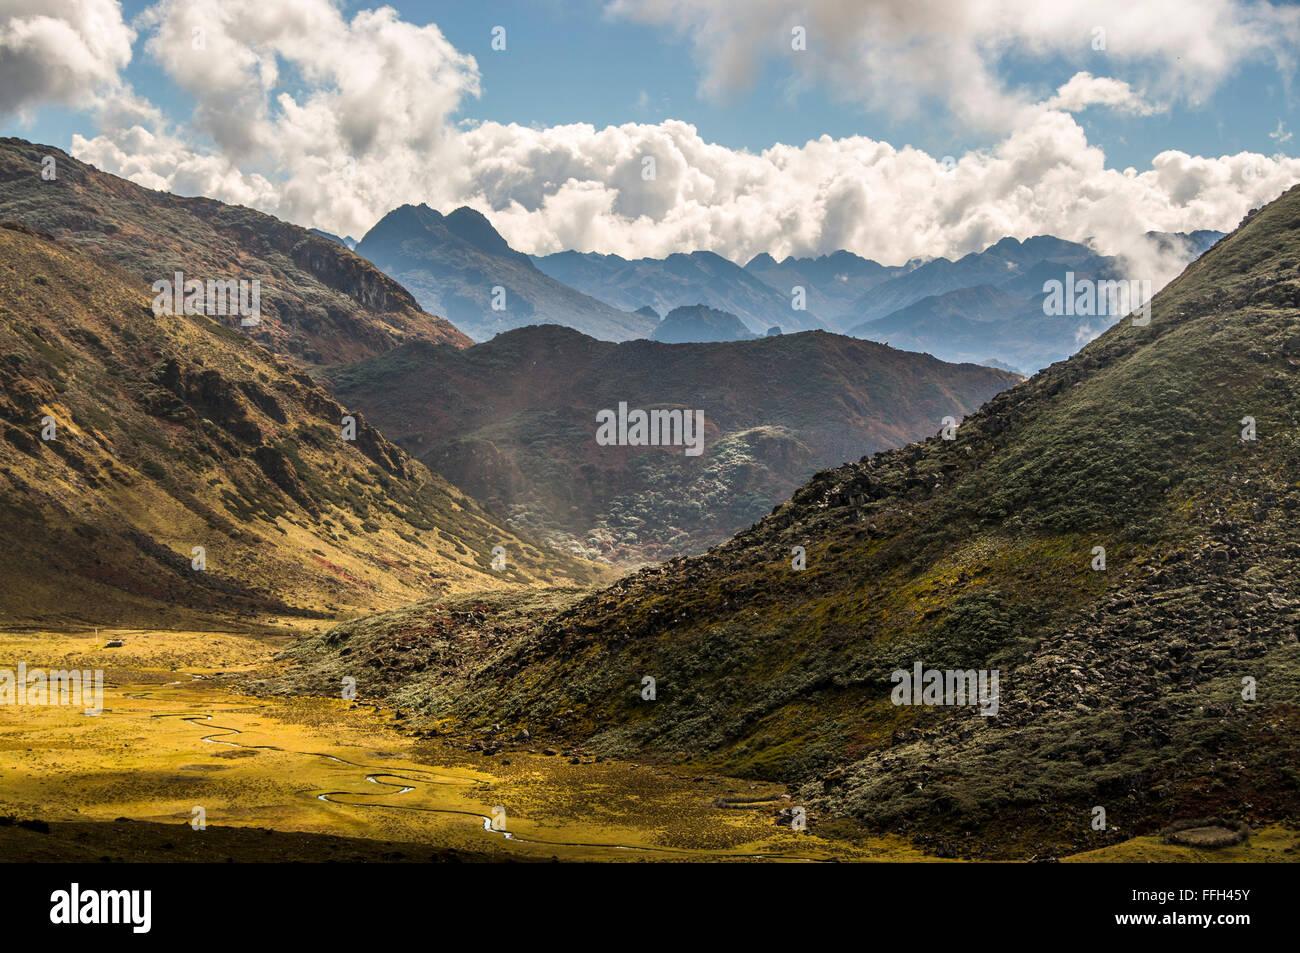 Himalayan landscapes - Stock Image